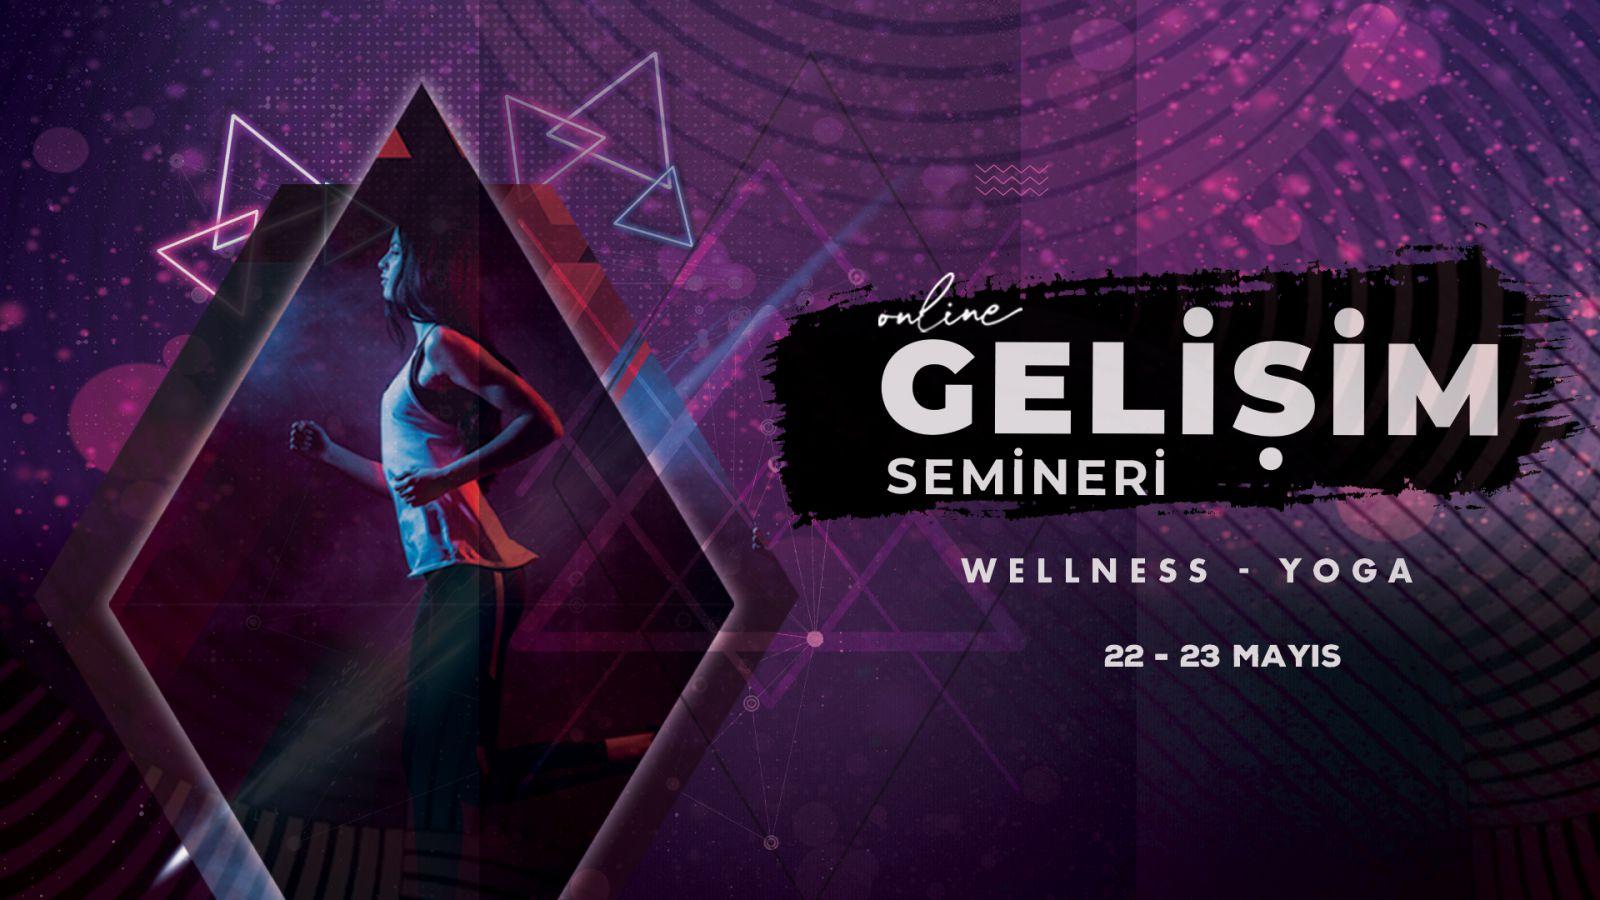 WELLNESS & YOGA GELİŞİM SEMİNERLERİ KATILIMCI LİSTESİ 22-23 MAYIS 2021